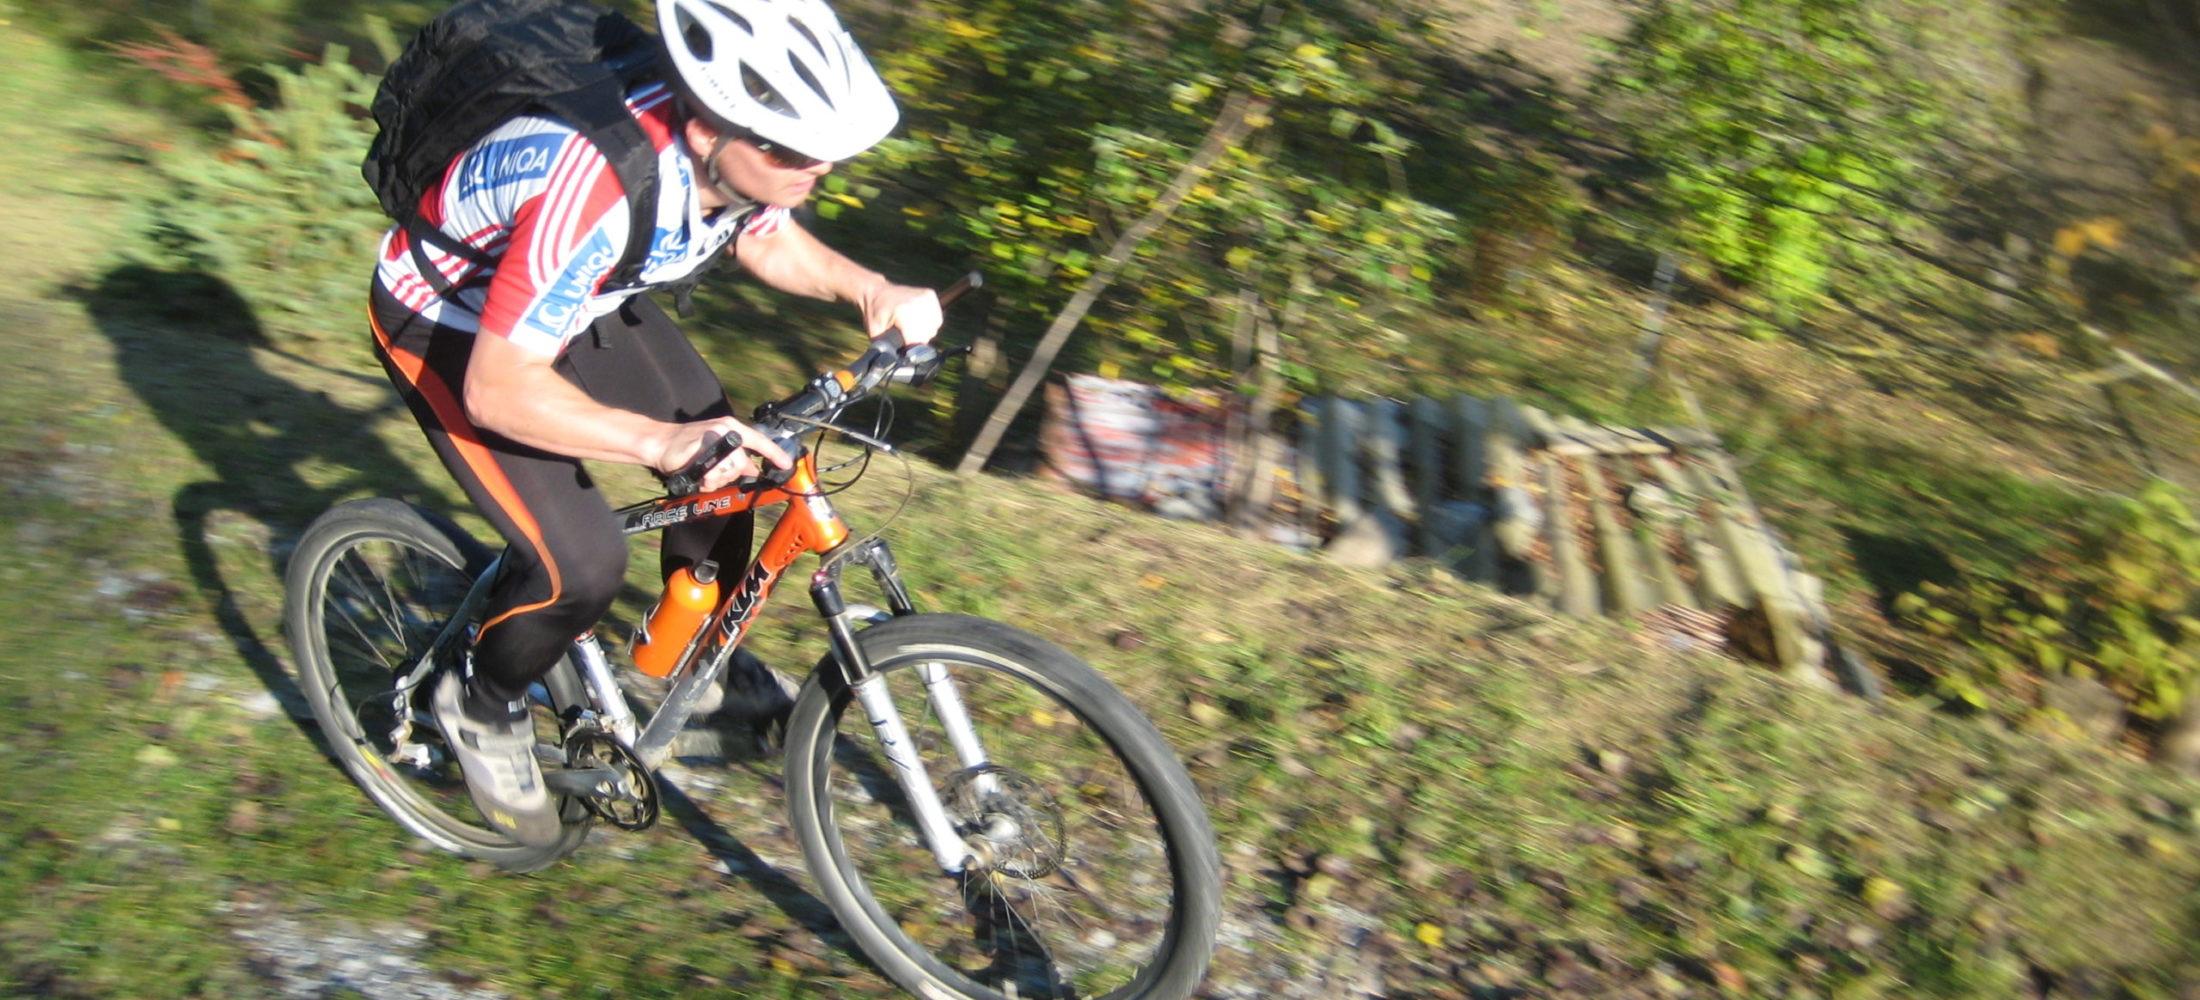 Mitterberg Race